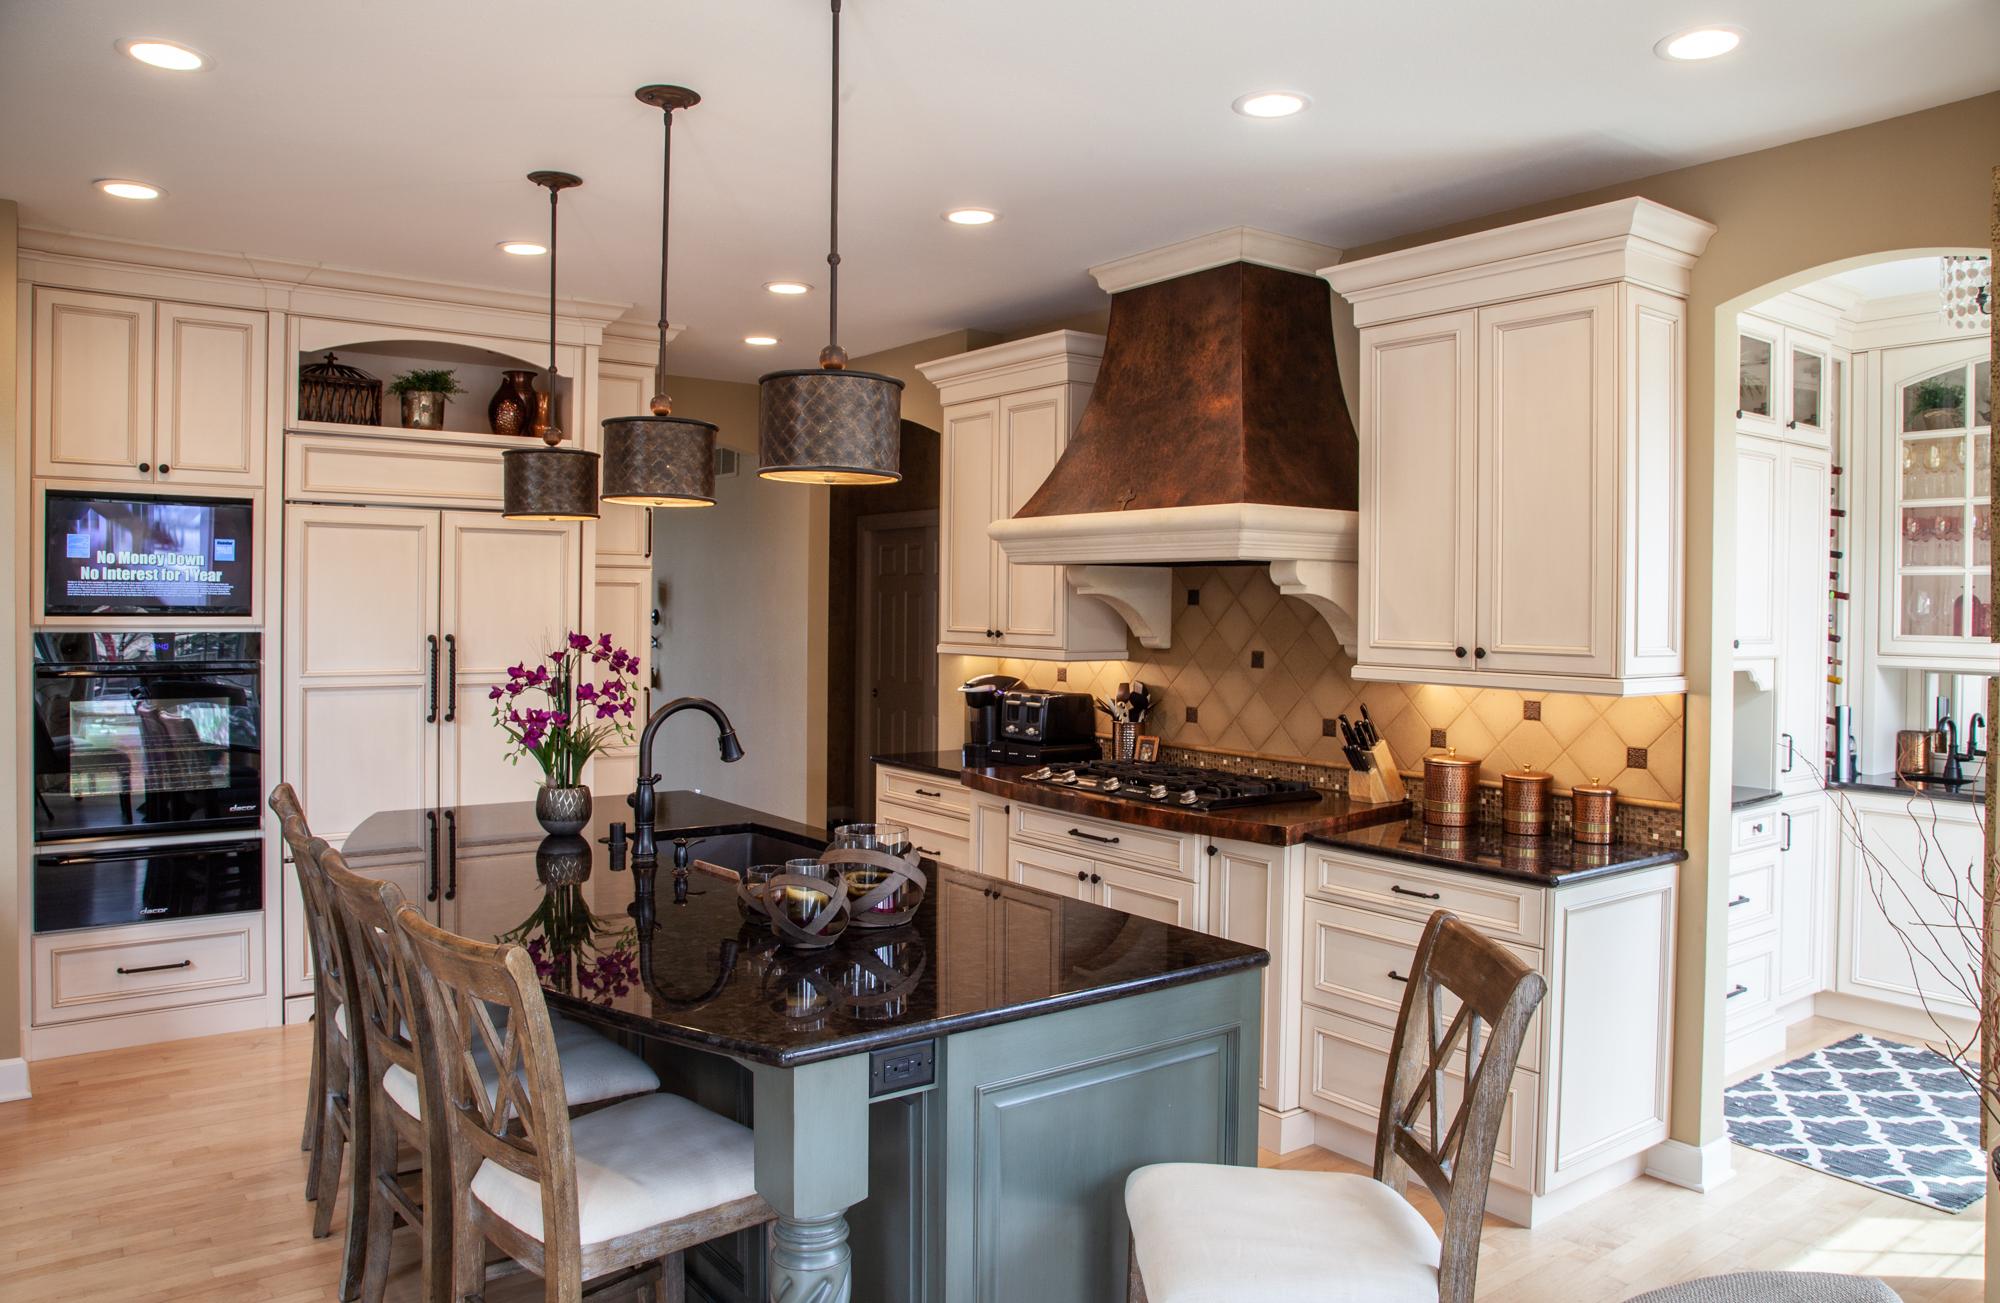 dream house dream kitchens. Black Bedroom Furniture Sets. Home Design Ideas